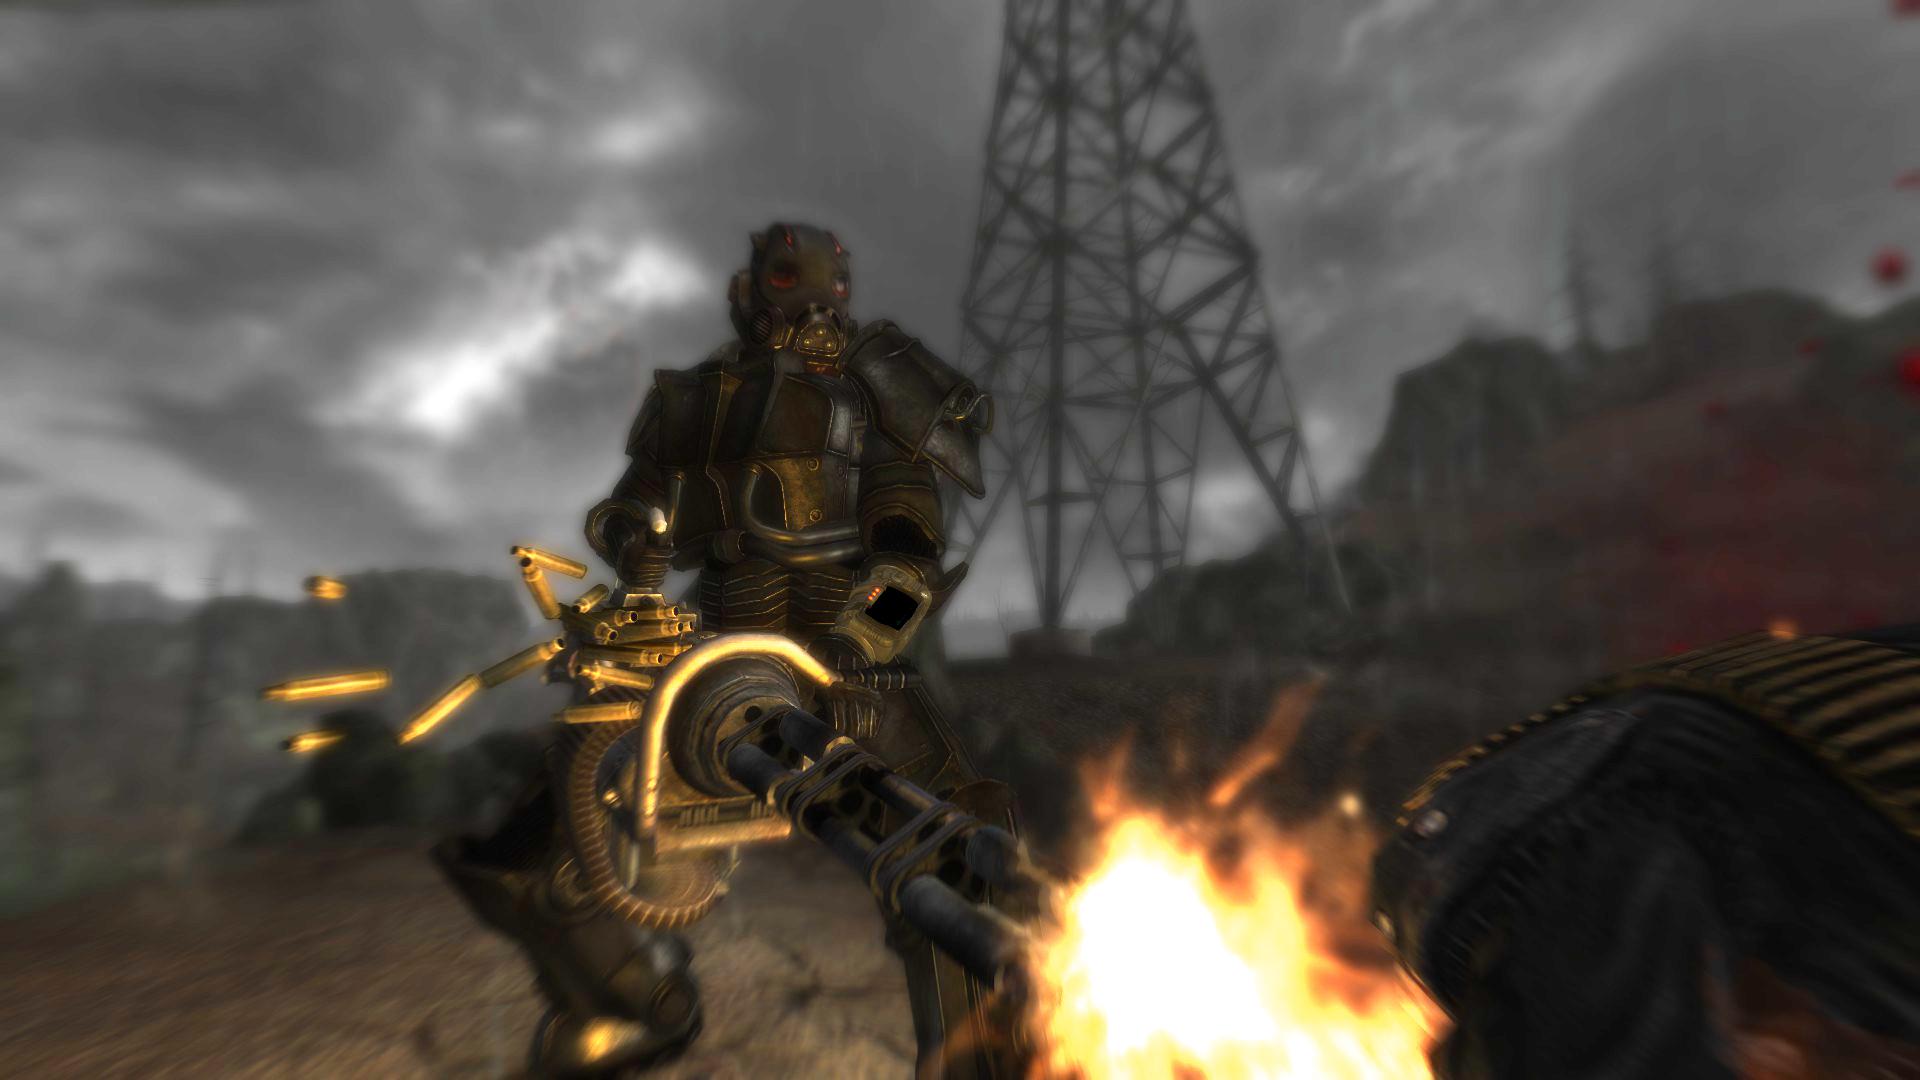 Fallout 4 marine armor retexture